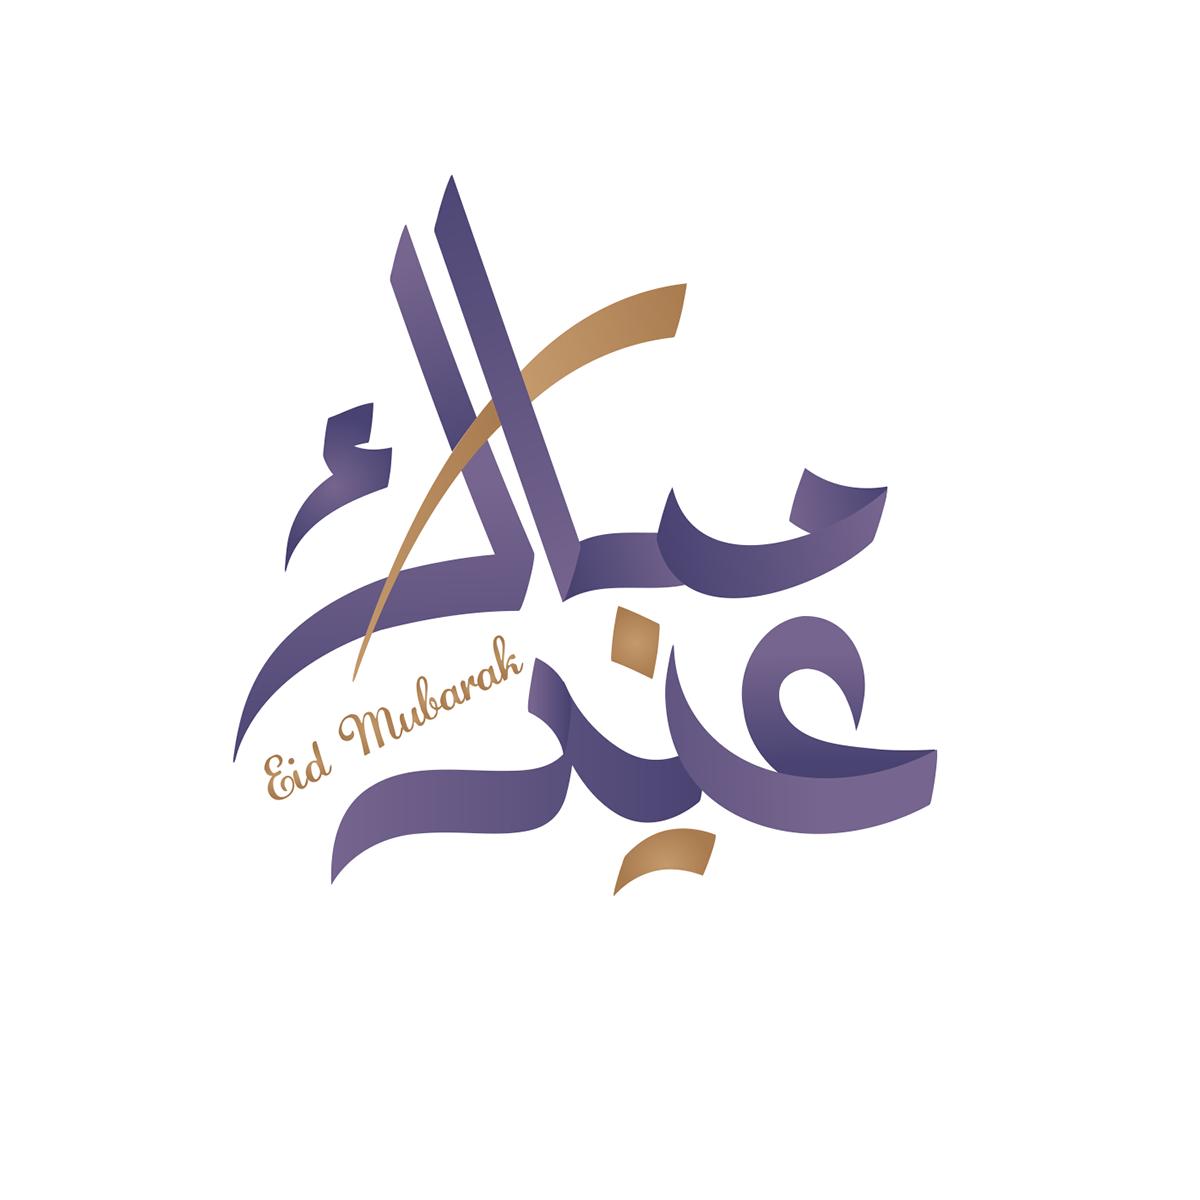 4 Eid Typography For Free . مجموعة مخطوطات بمناسبة العيد  16a89342377267.57caa6f780cd9